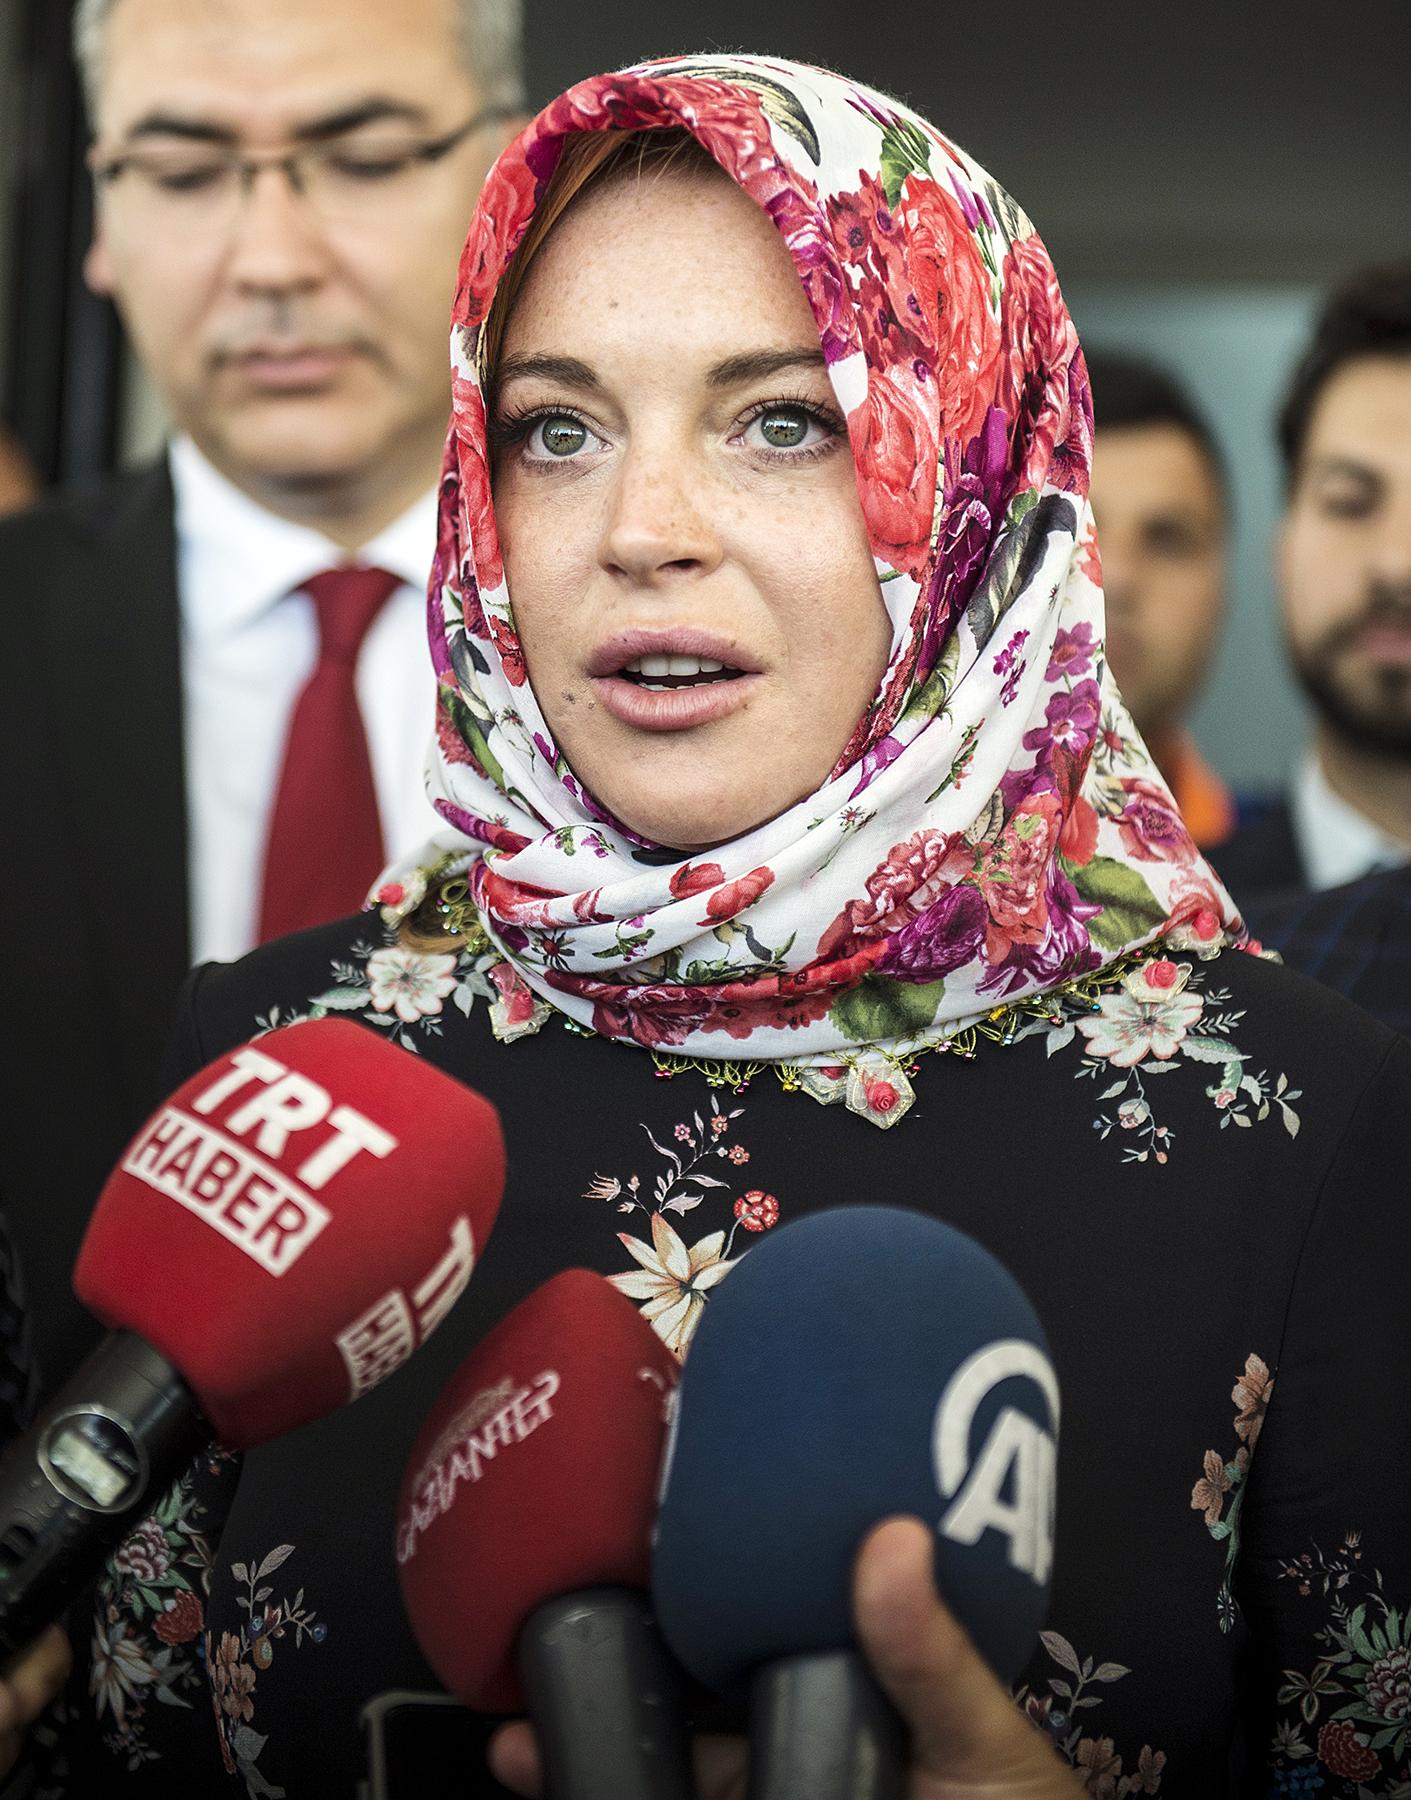 Lindsay Lohan headscarf Turkey